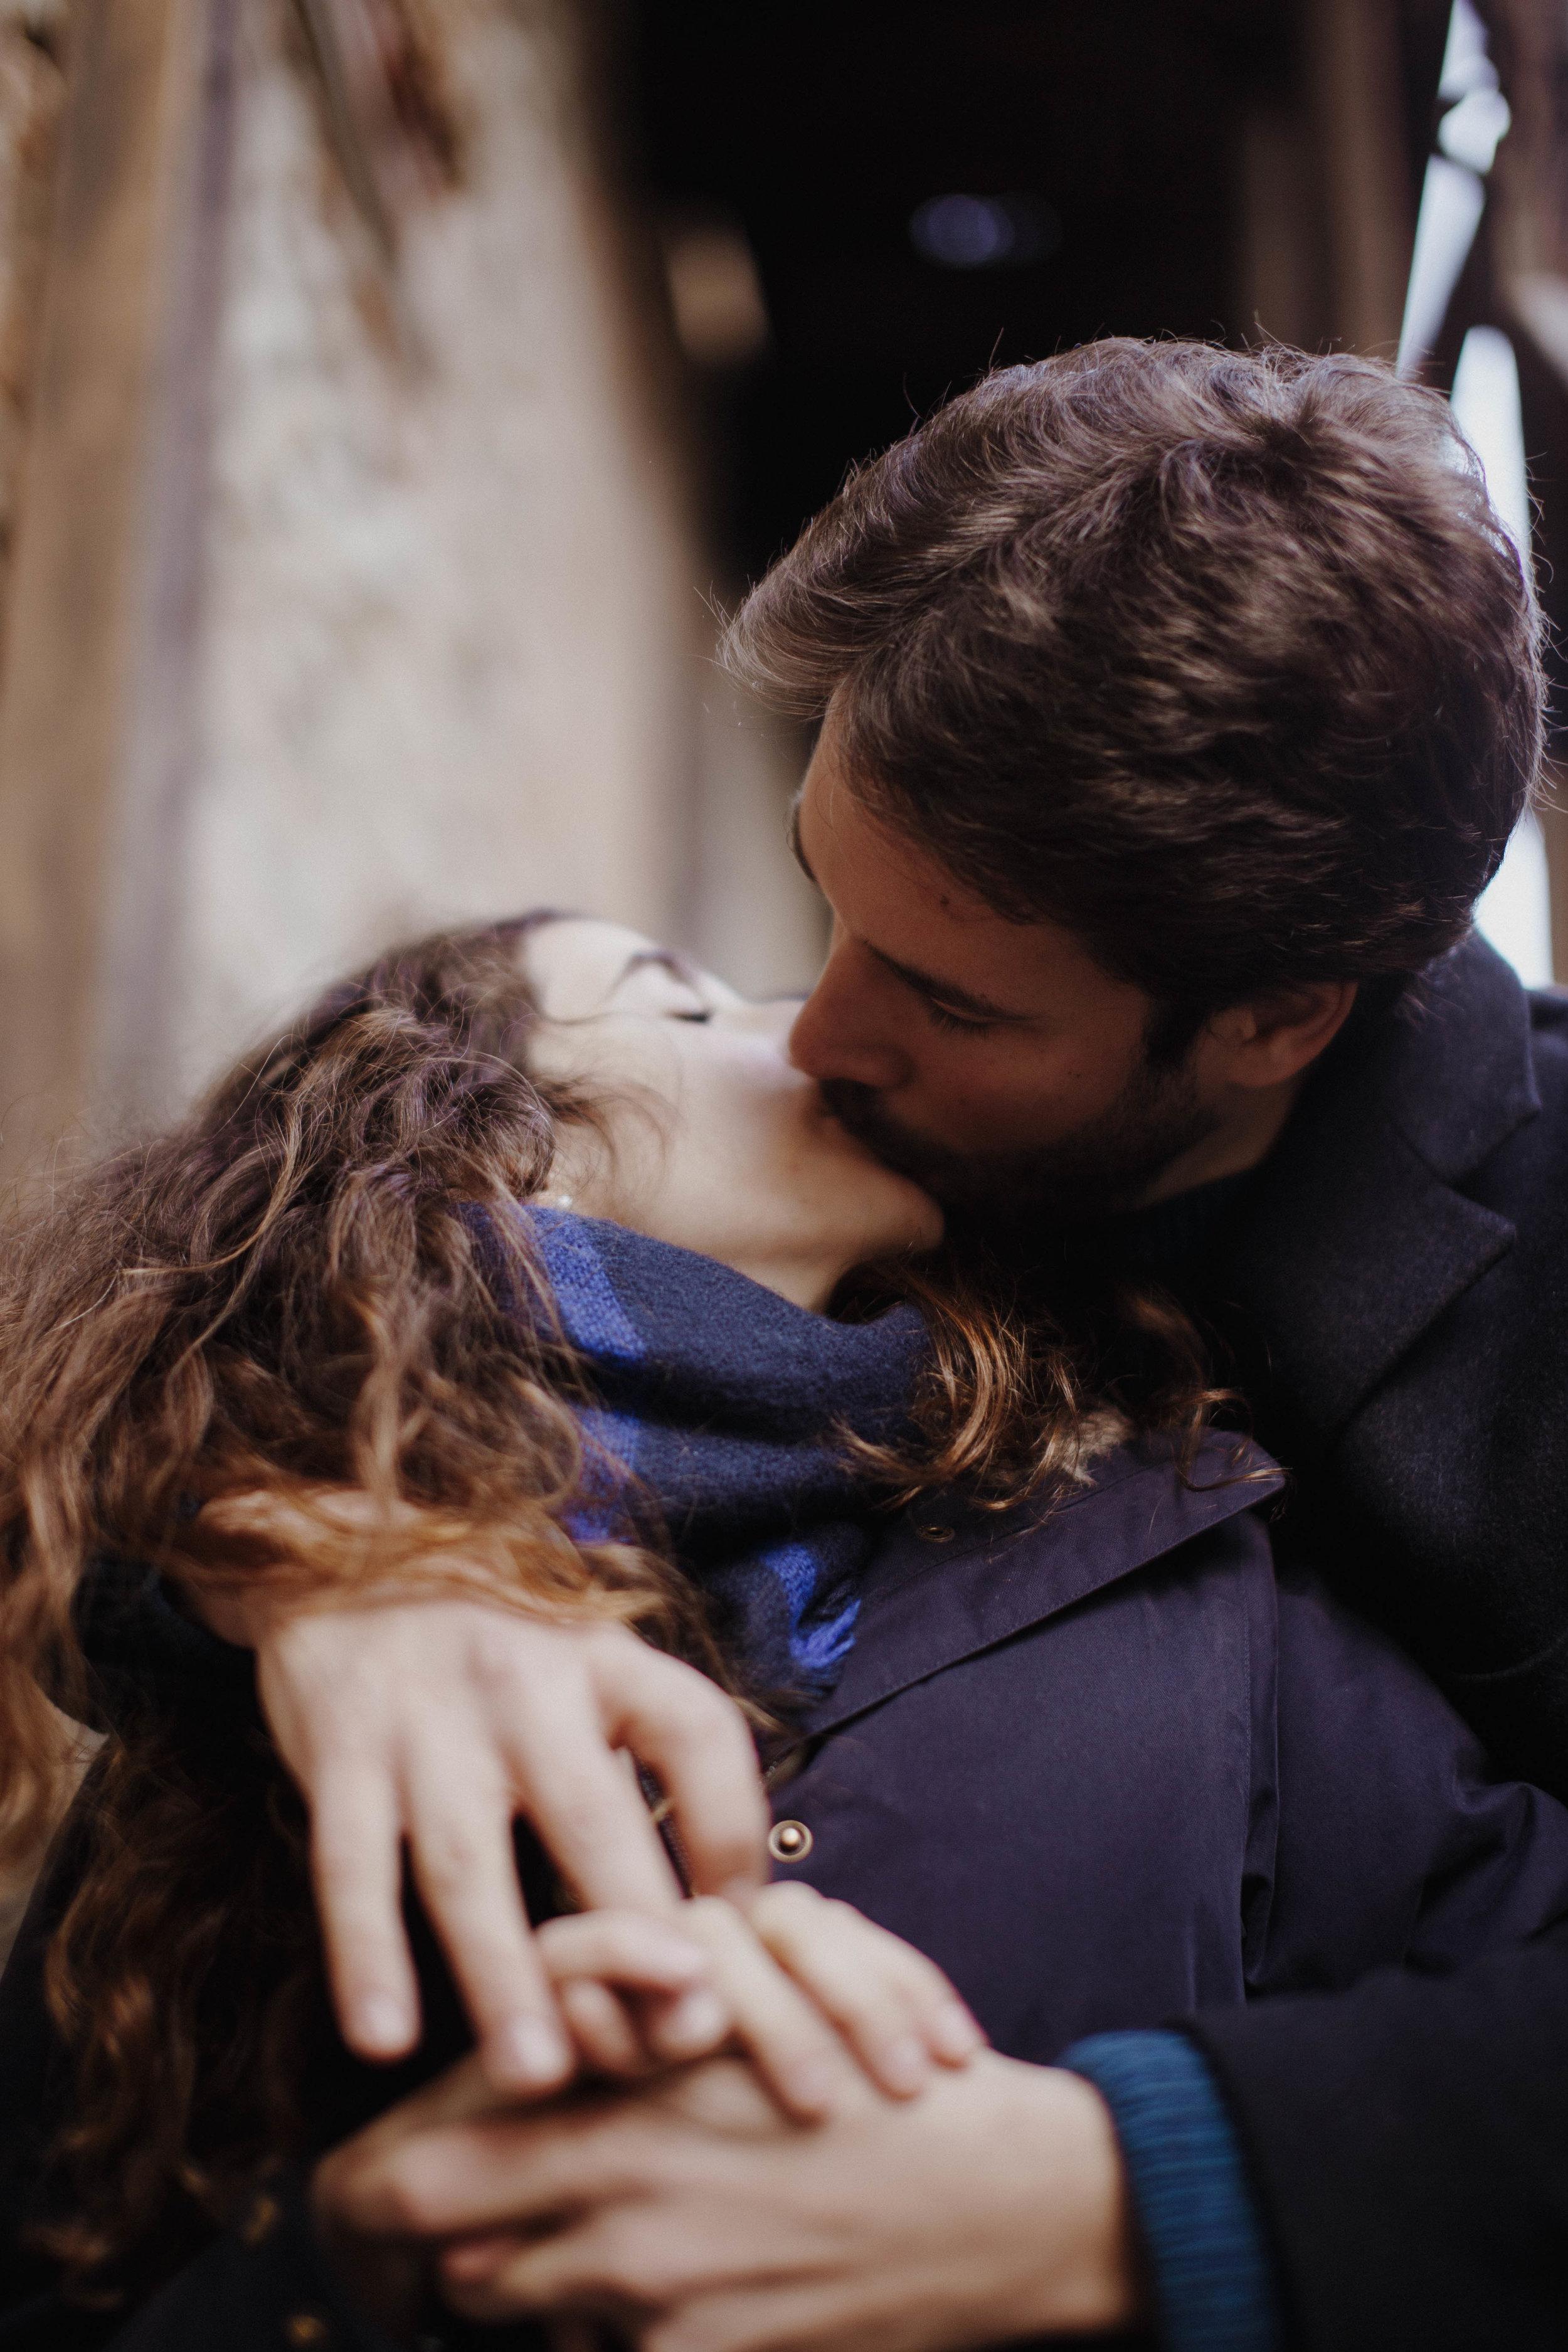 066 - Elisa + Riccardo - engagement.JPG